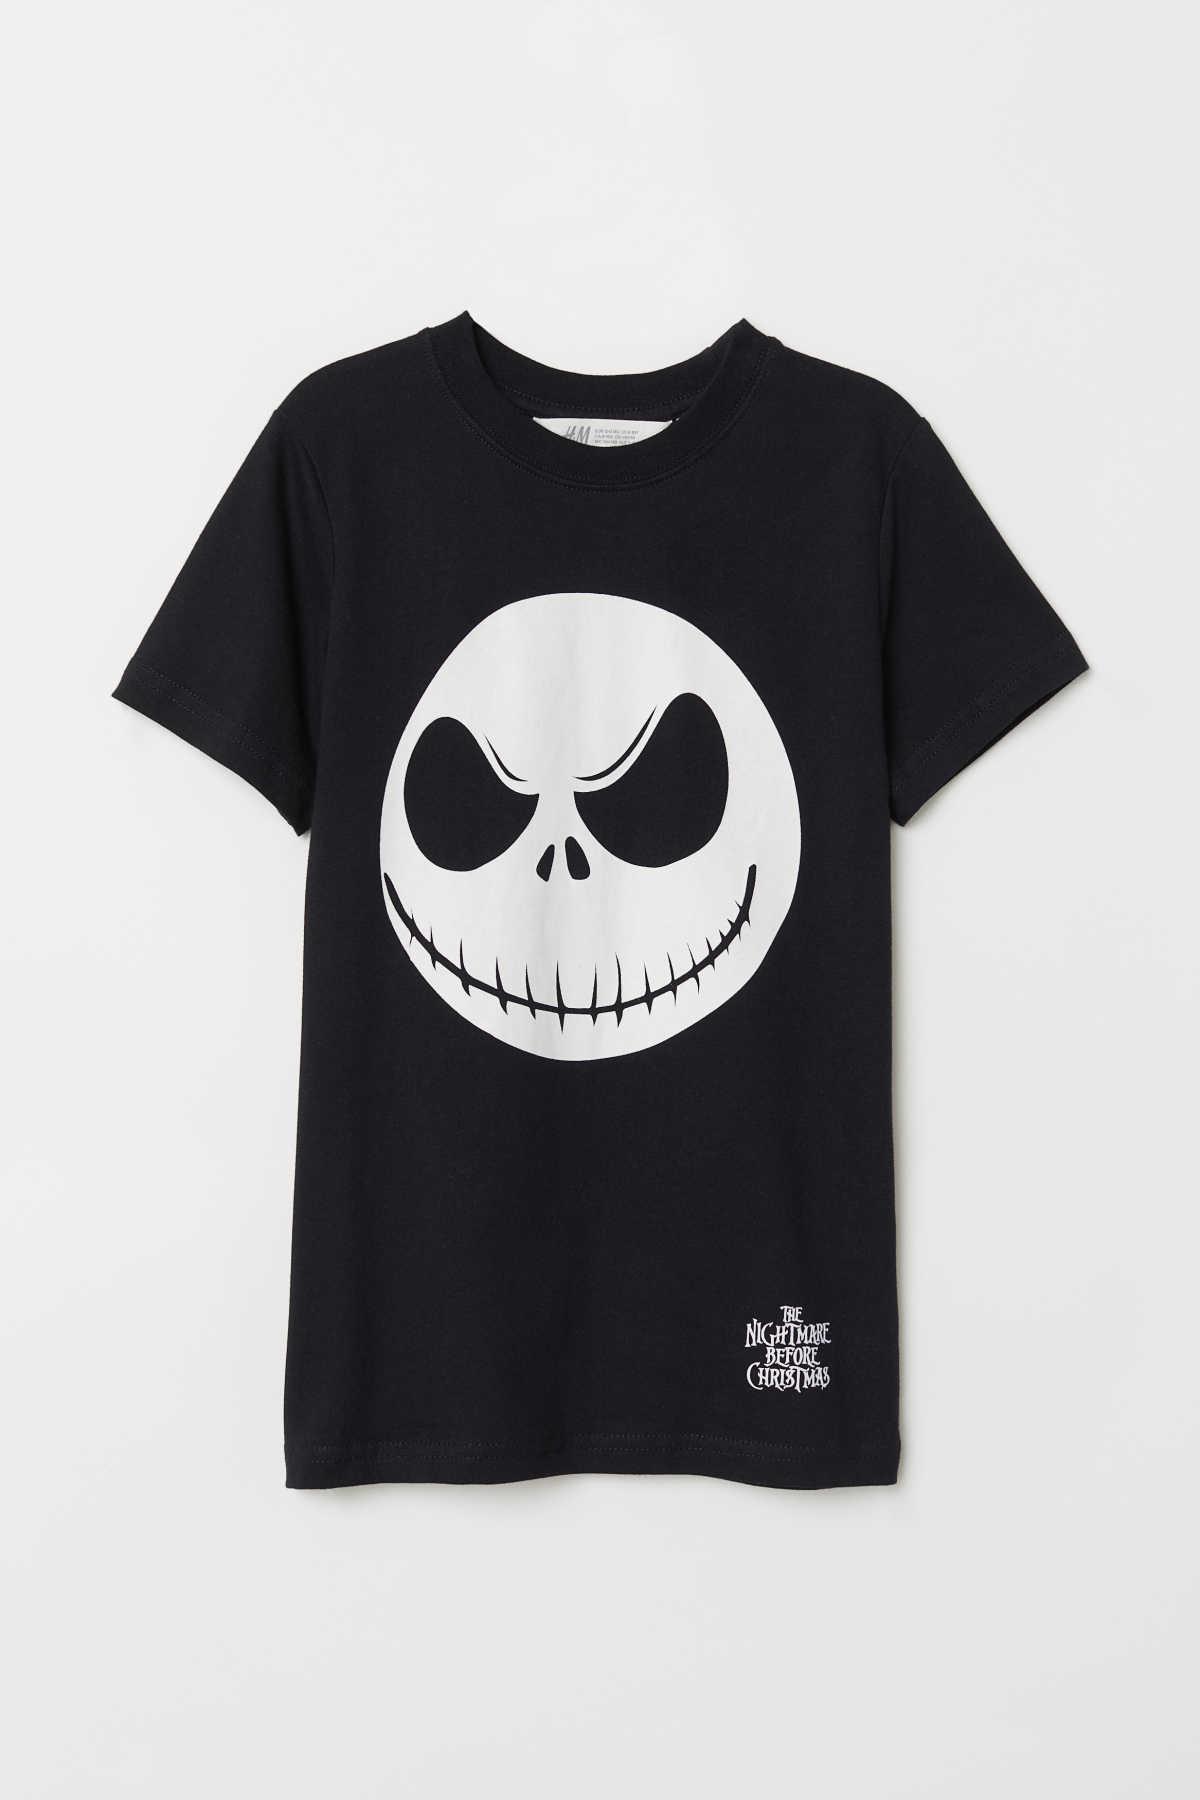 T-shirt with a motif | Black/Jack Skellington | KIDS | H&M IS